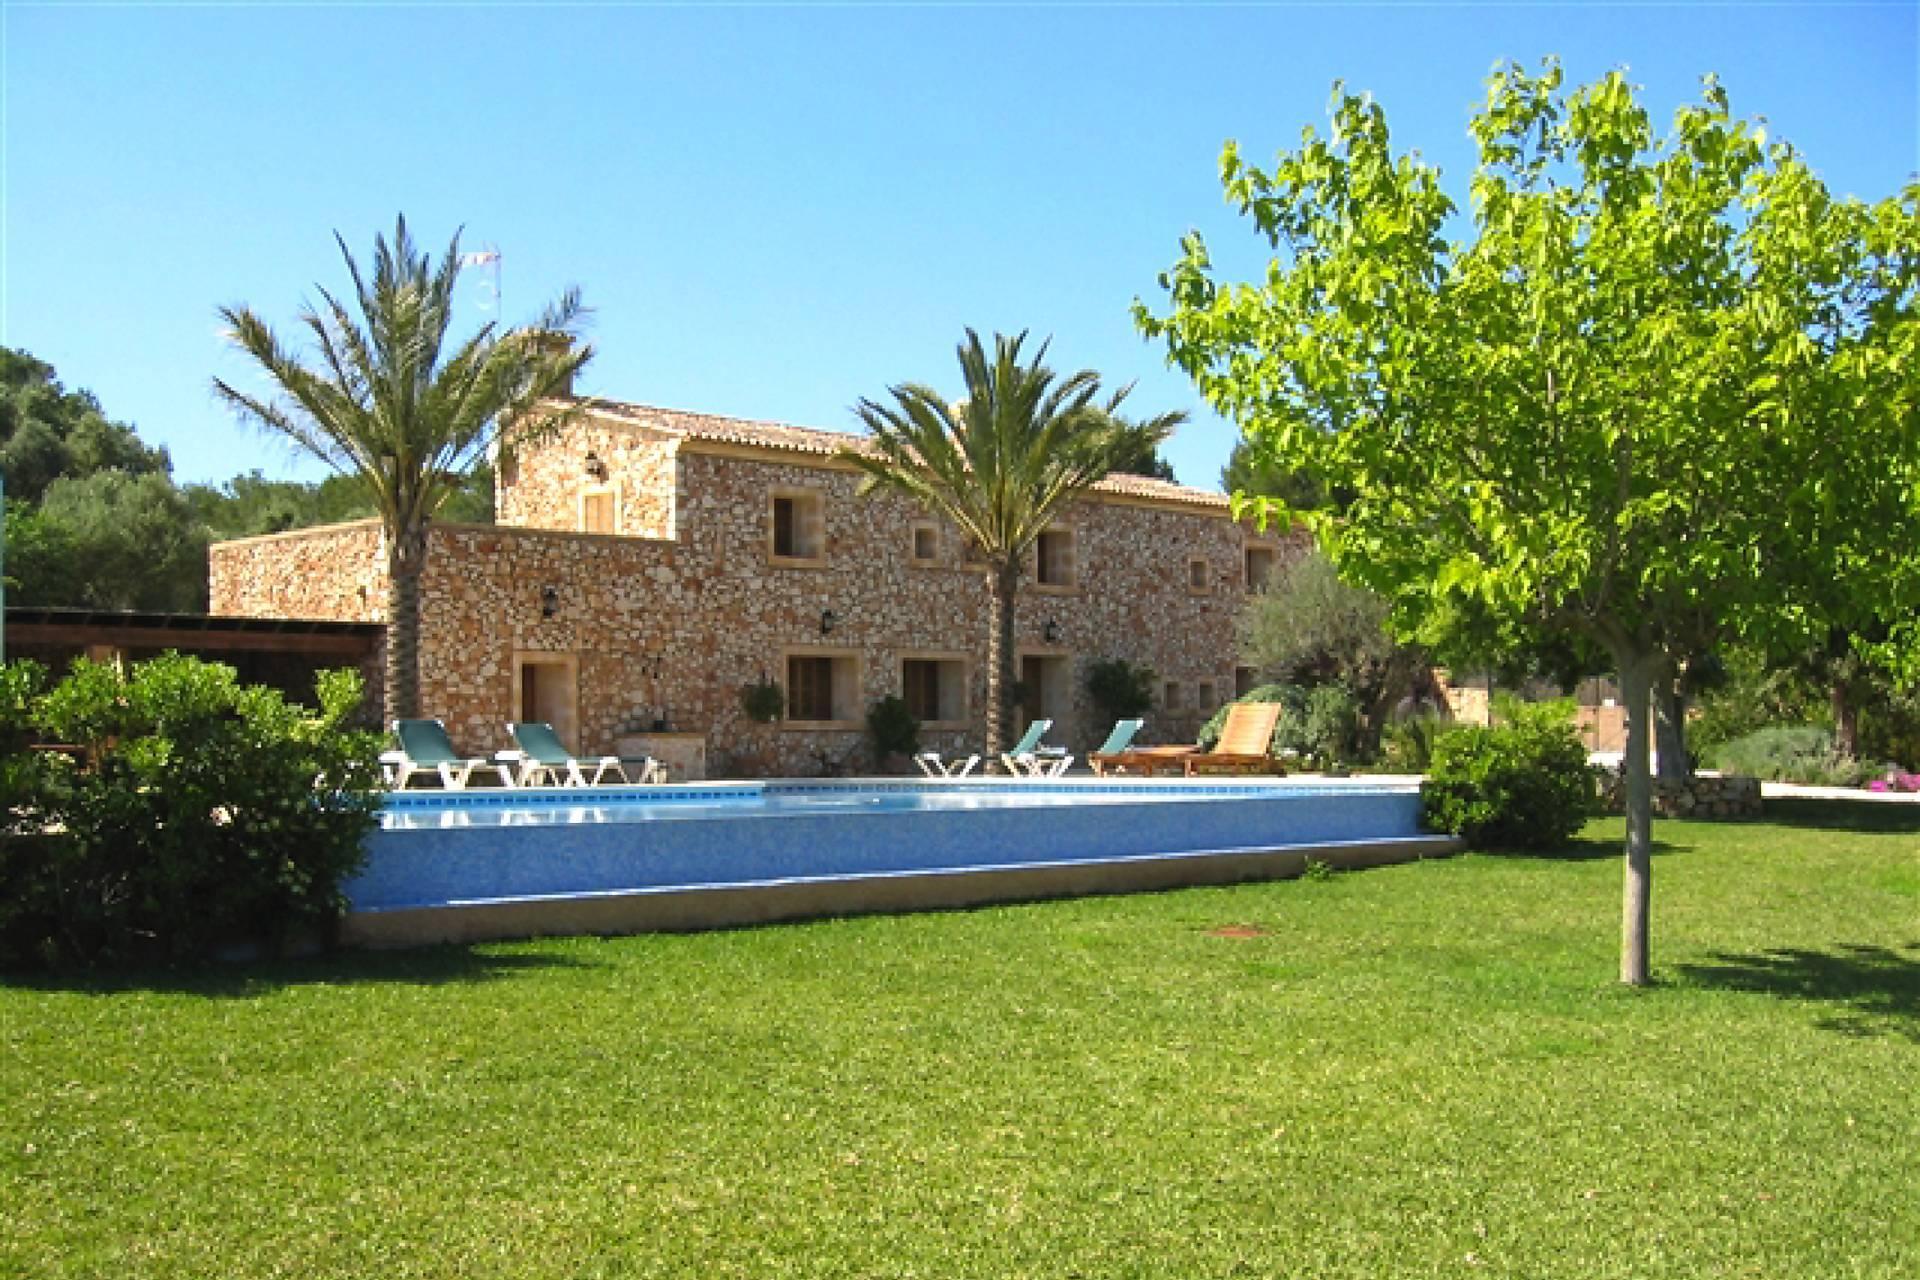 01-66 Rustikale Finca Mallorca Osten Bild 3